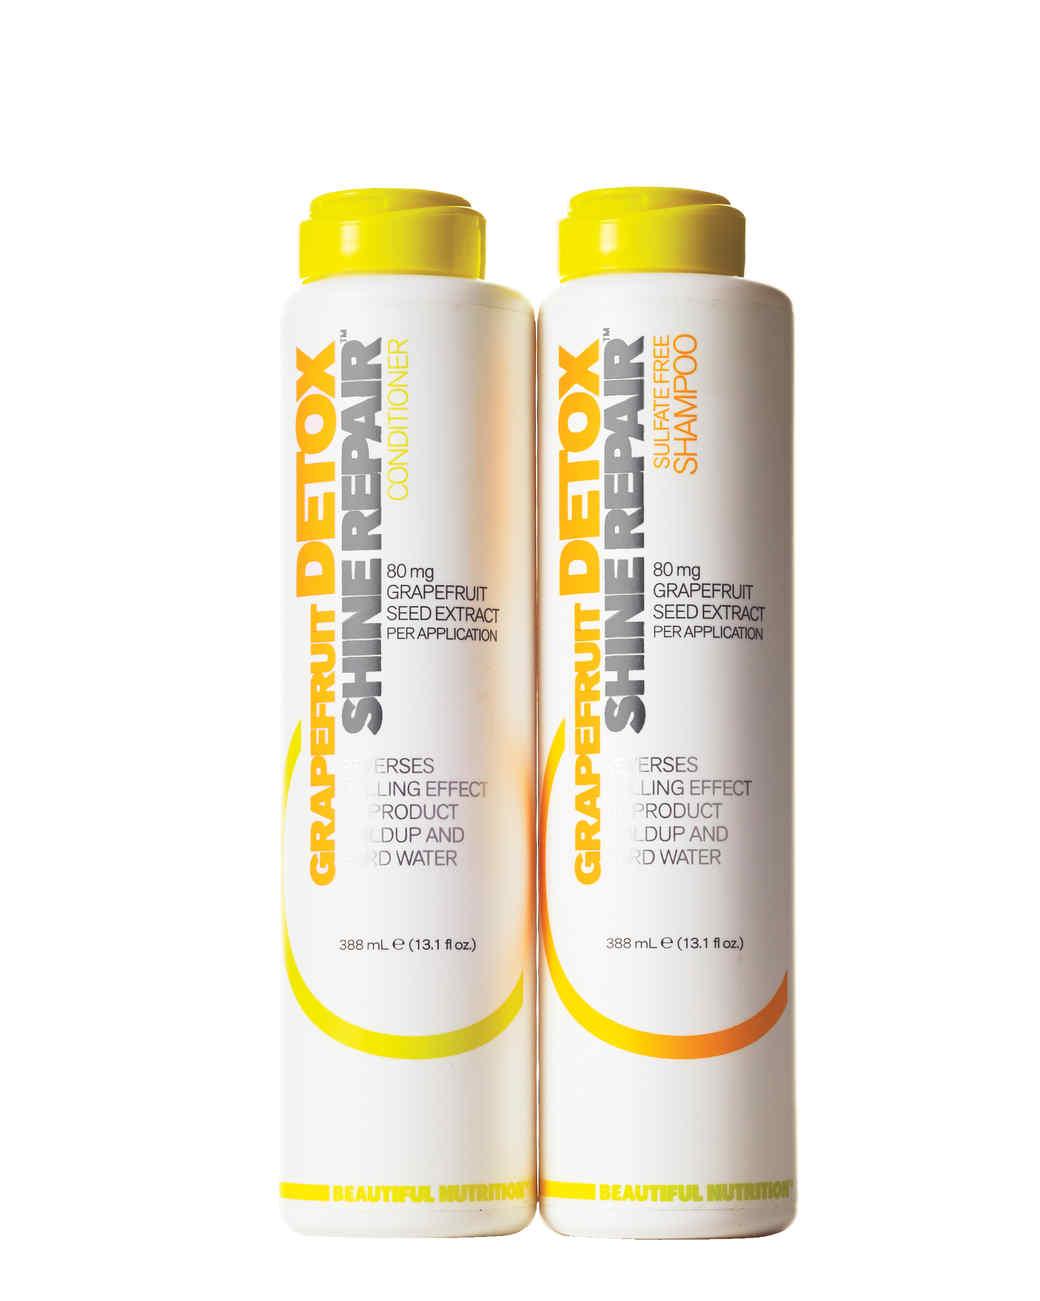 beautiful-nutrition-grapefruit-detox-shine-repair-shampoo-conditioner-022-d112325.jpg